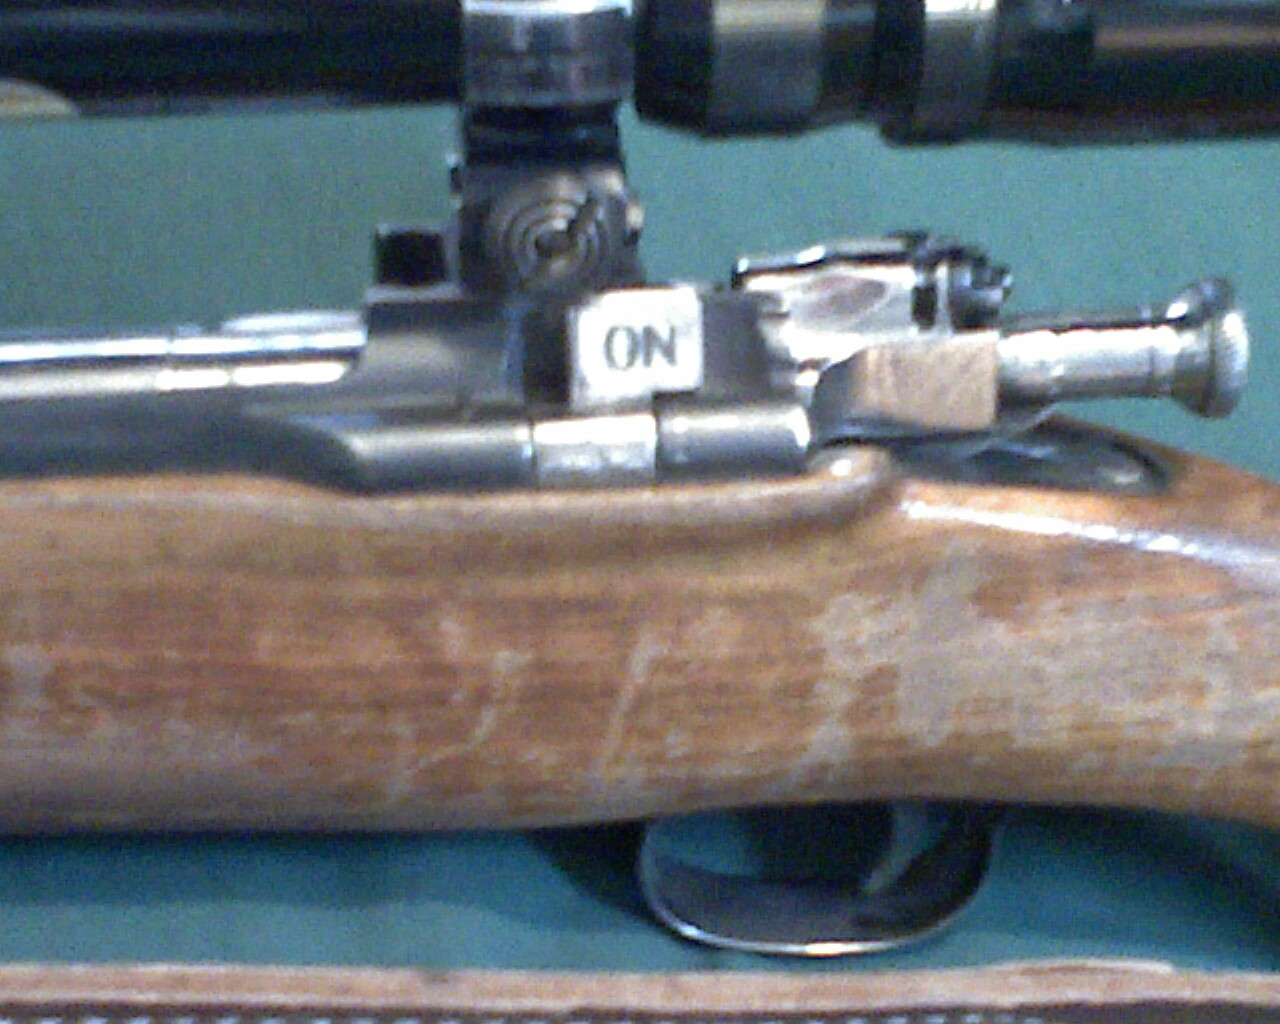 A few pics of my guns-photo_031609_002.jpg